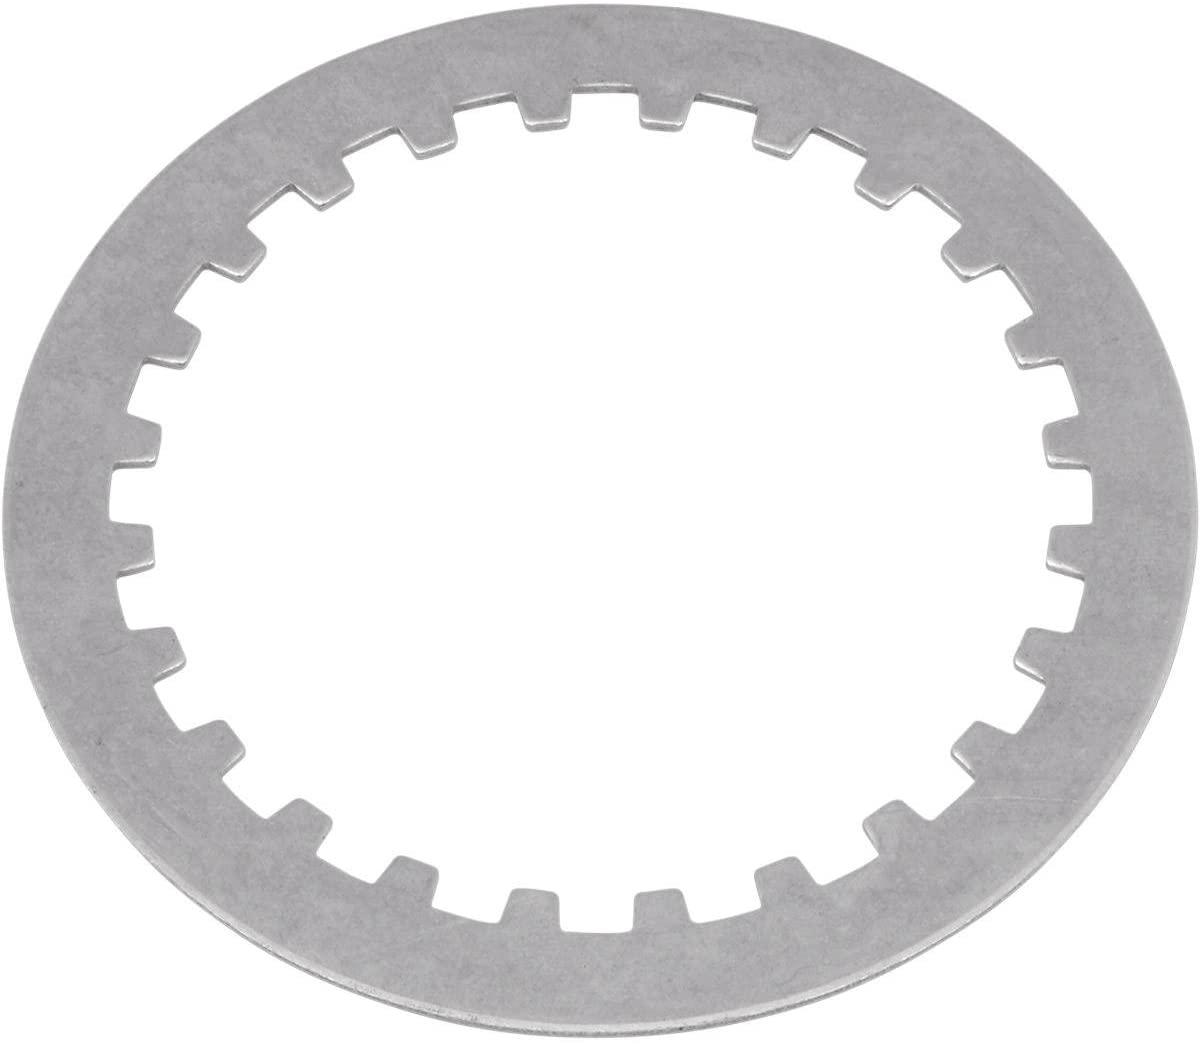 KG Clutch Factory Steel Plate for Kawasaki KLX110 KX65